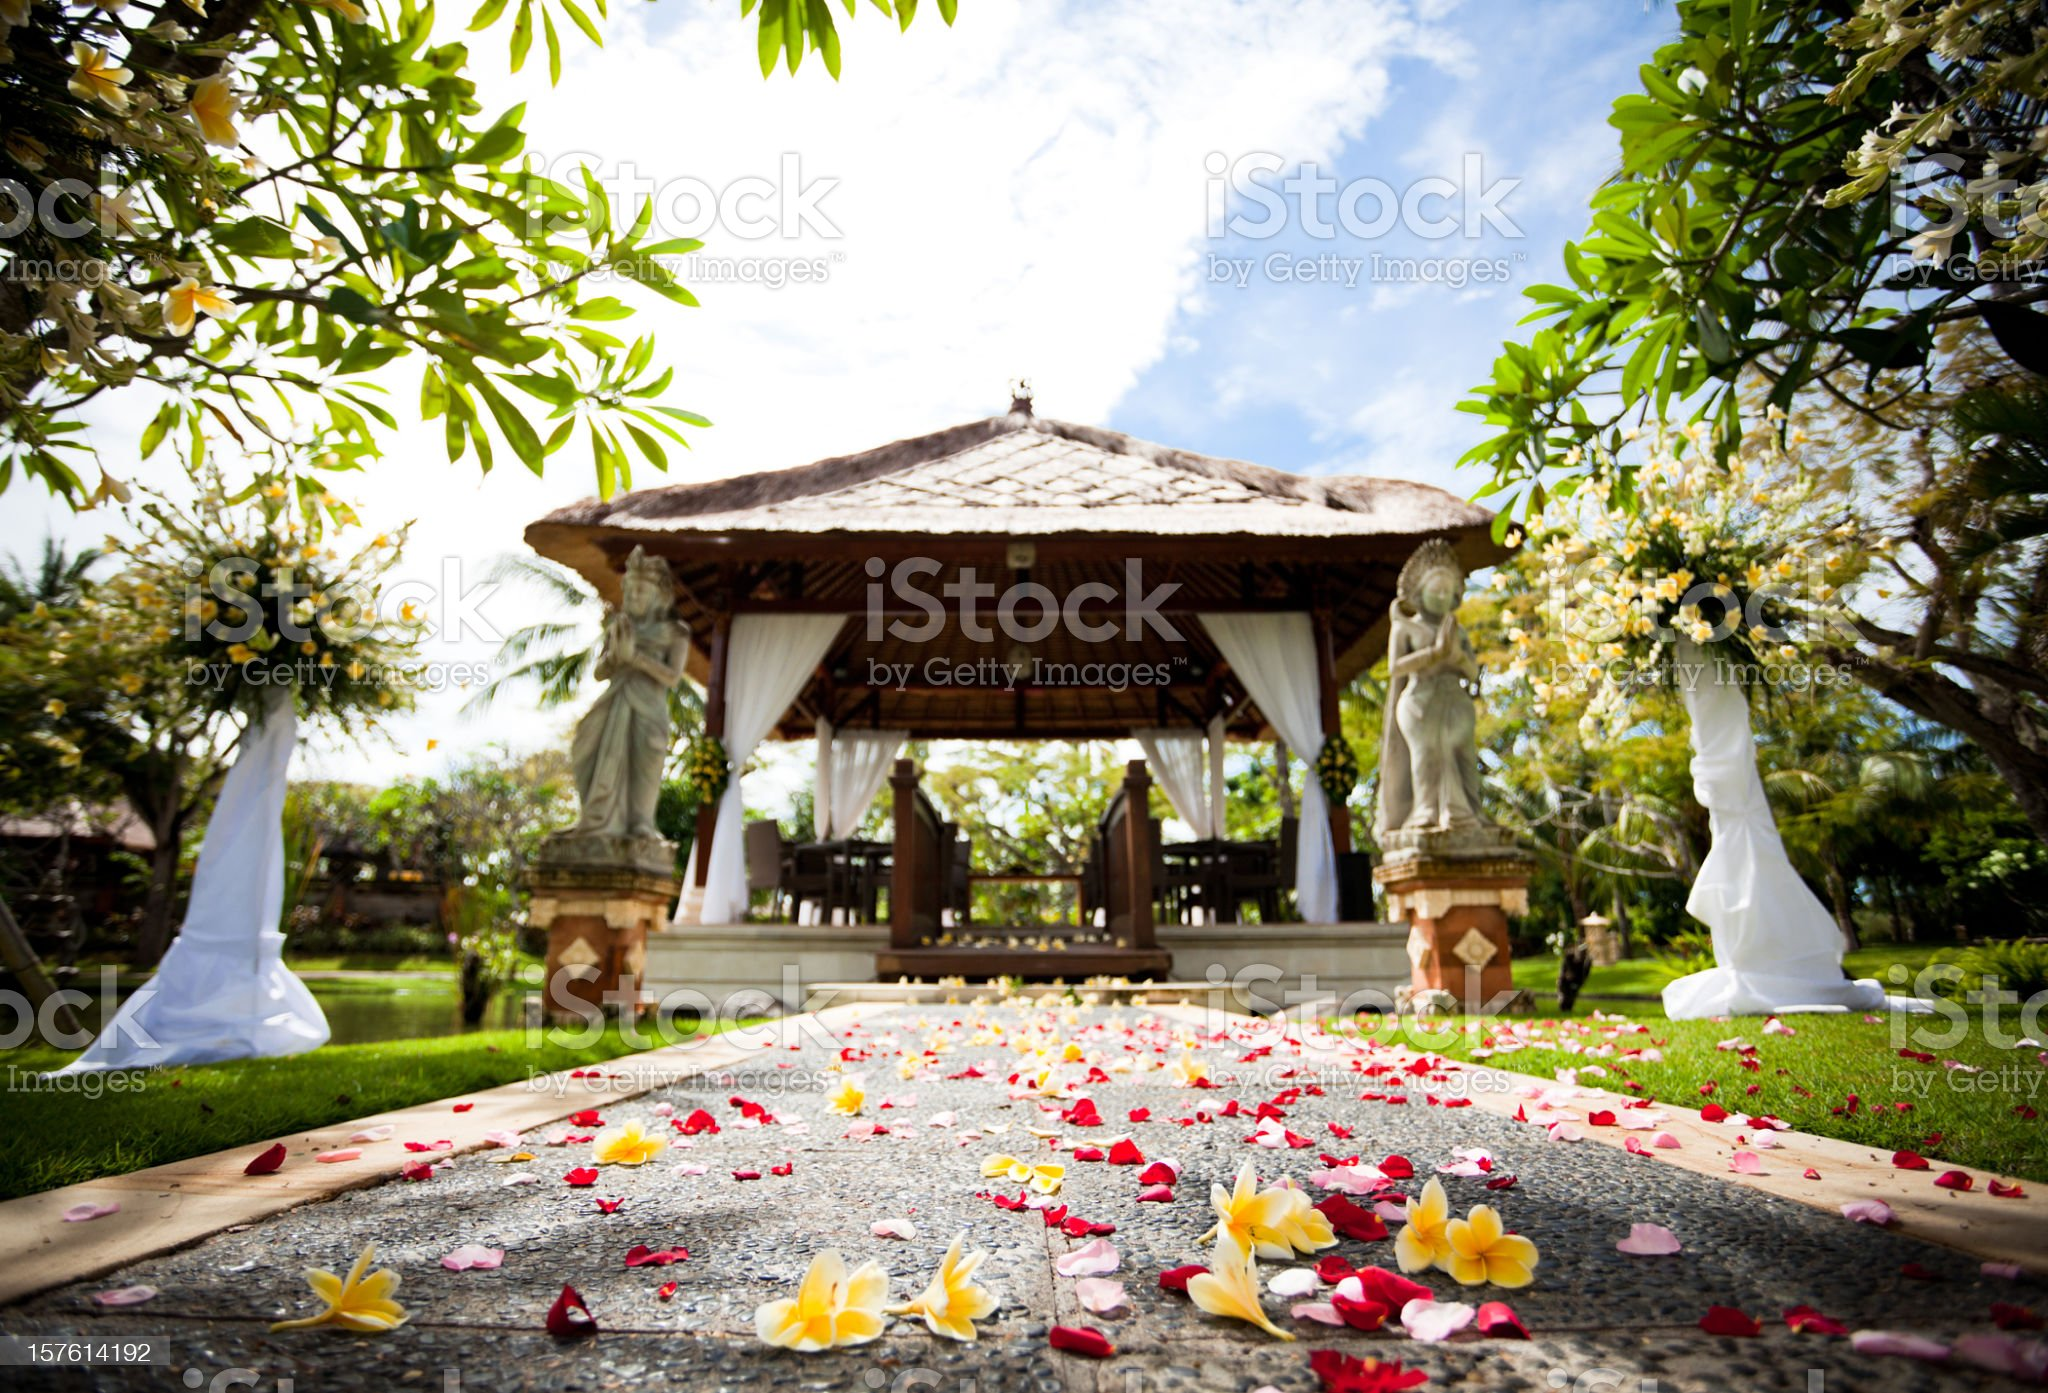 flowers and path to wedding gazebo royalty-free stock photo